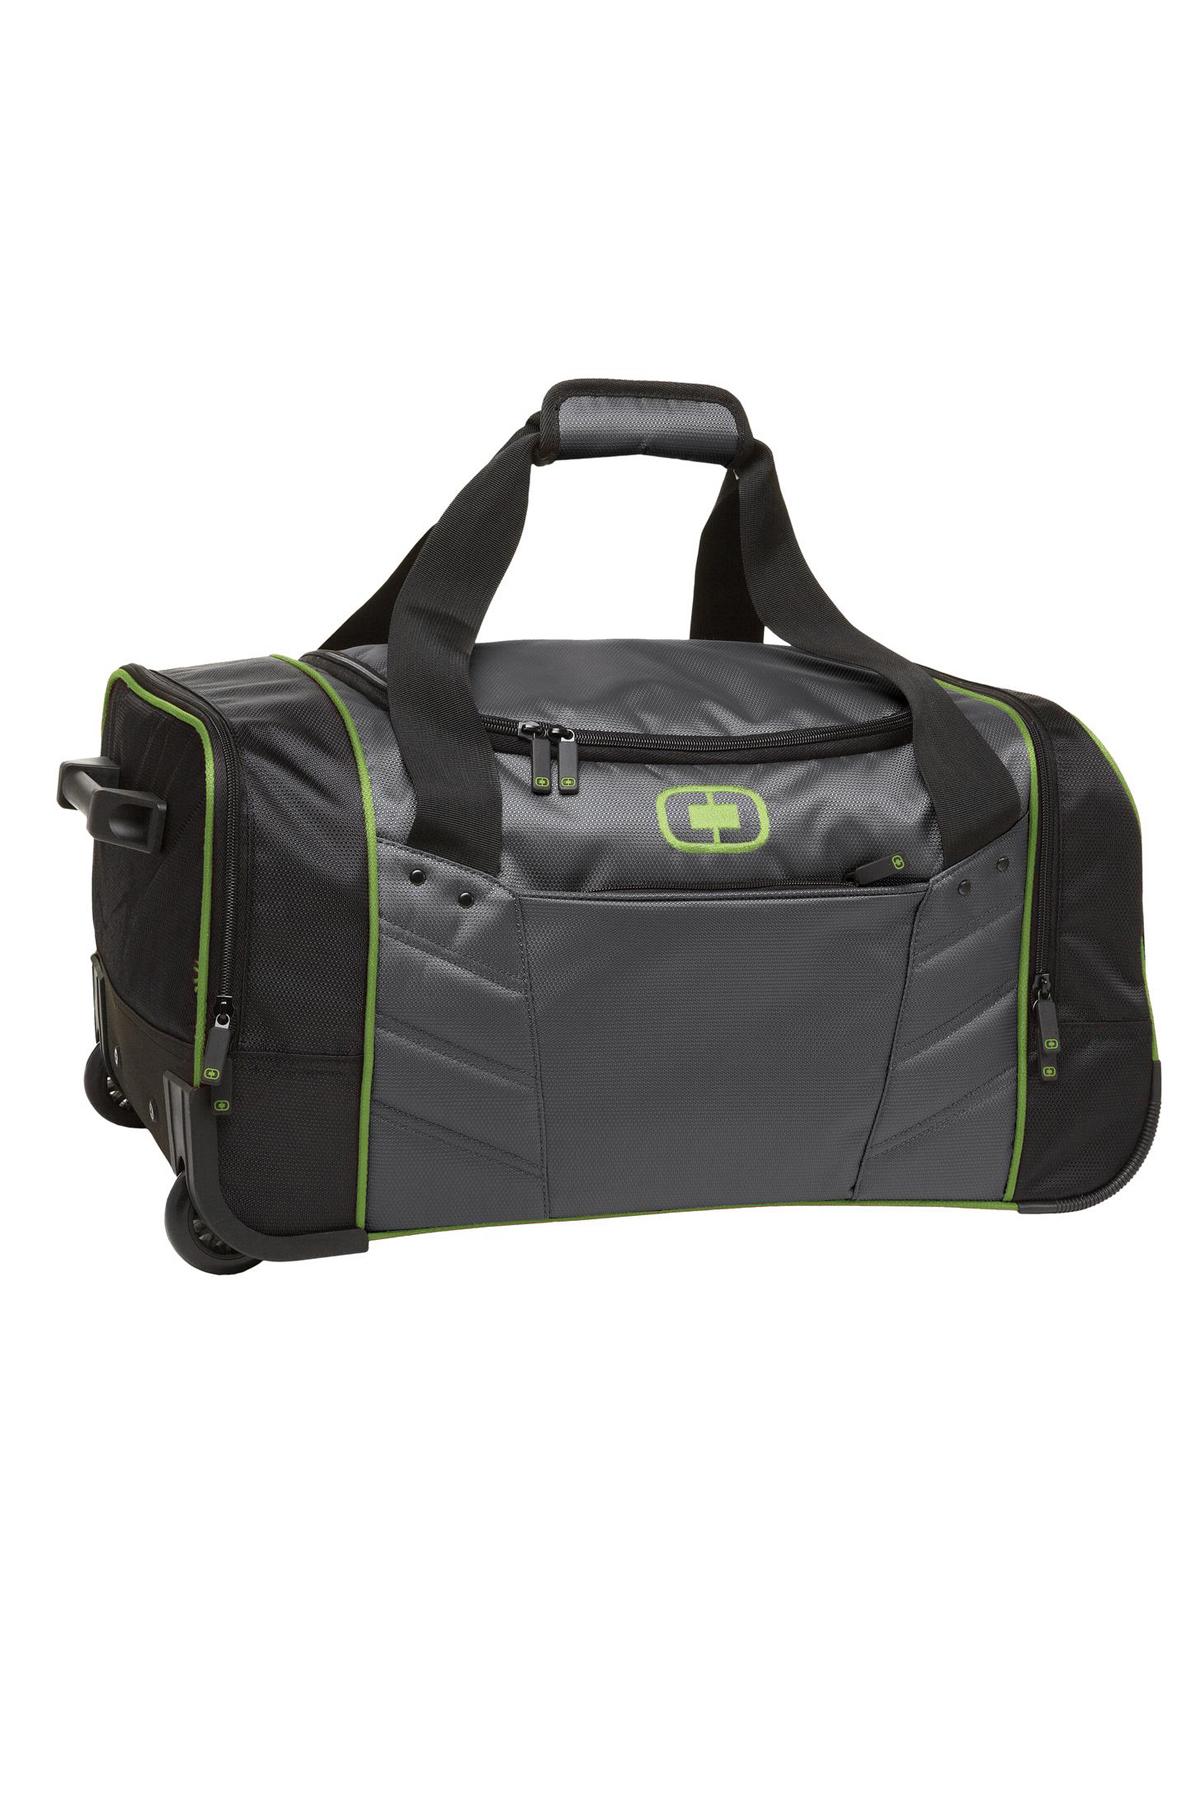 Bags-Duffels-3